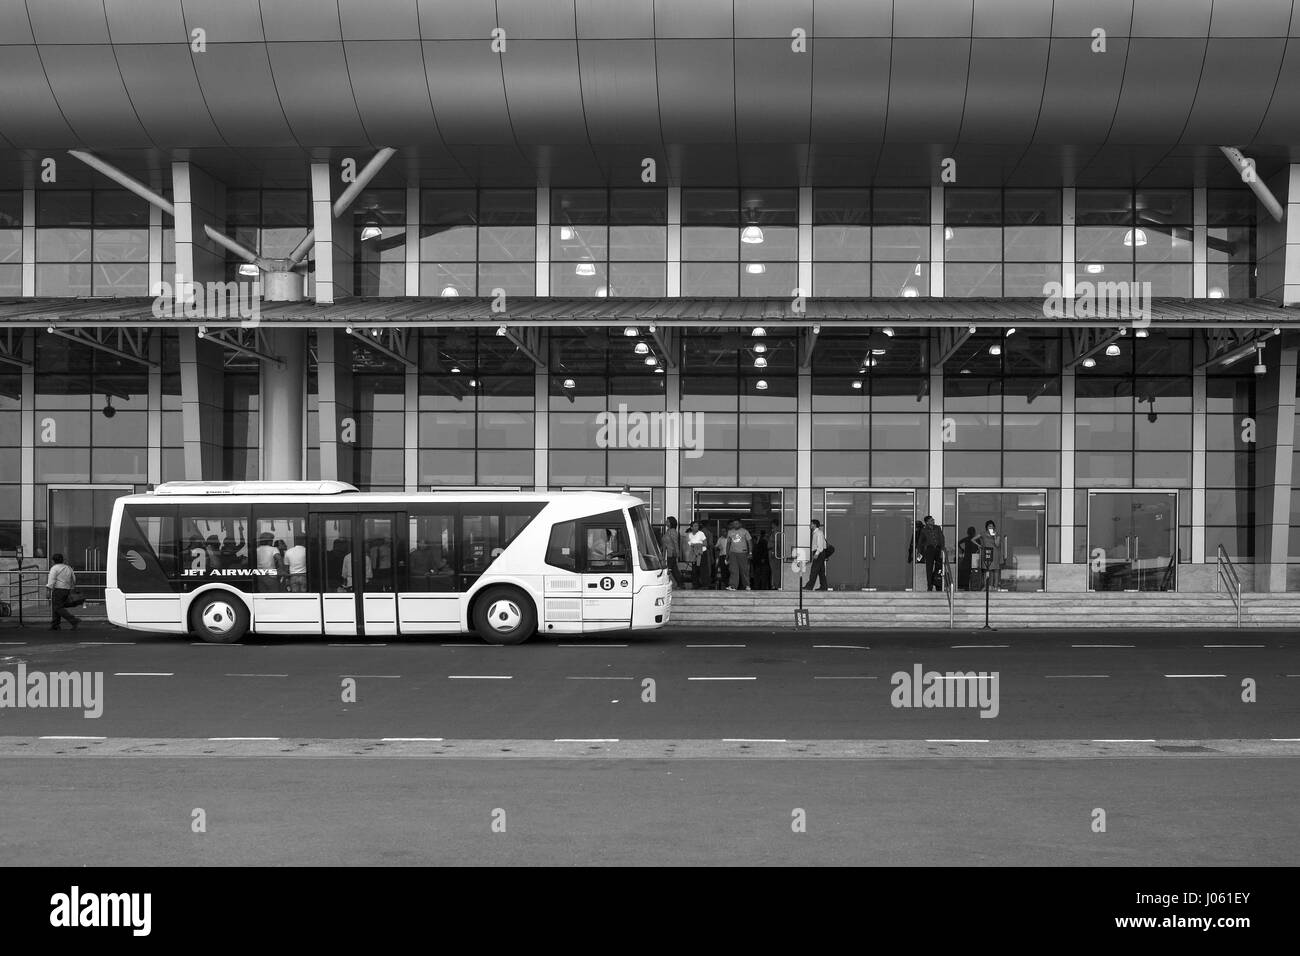 Chhatrapati shivaji domestic airport departing gate, mumbai, maharashtra, india, asia - Stock Image